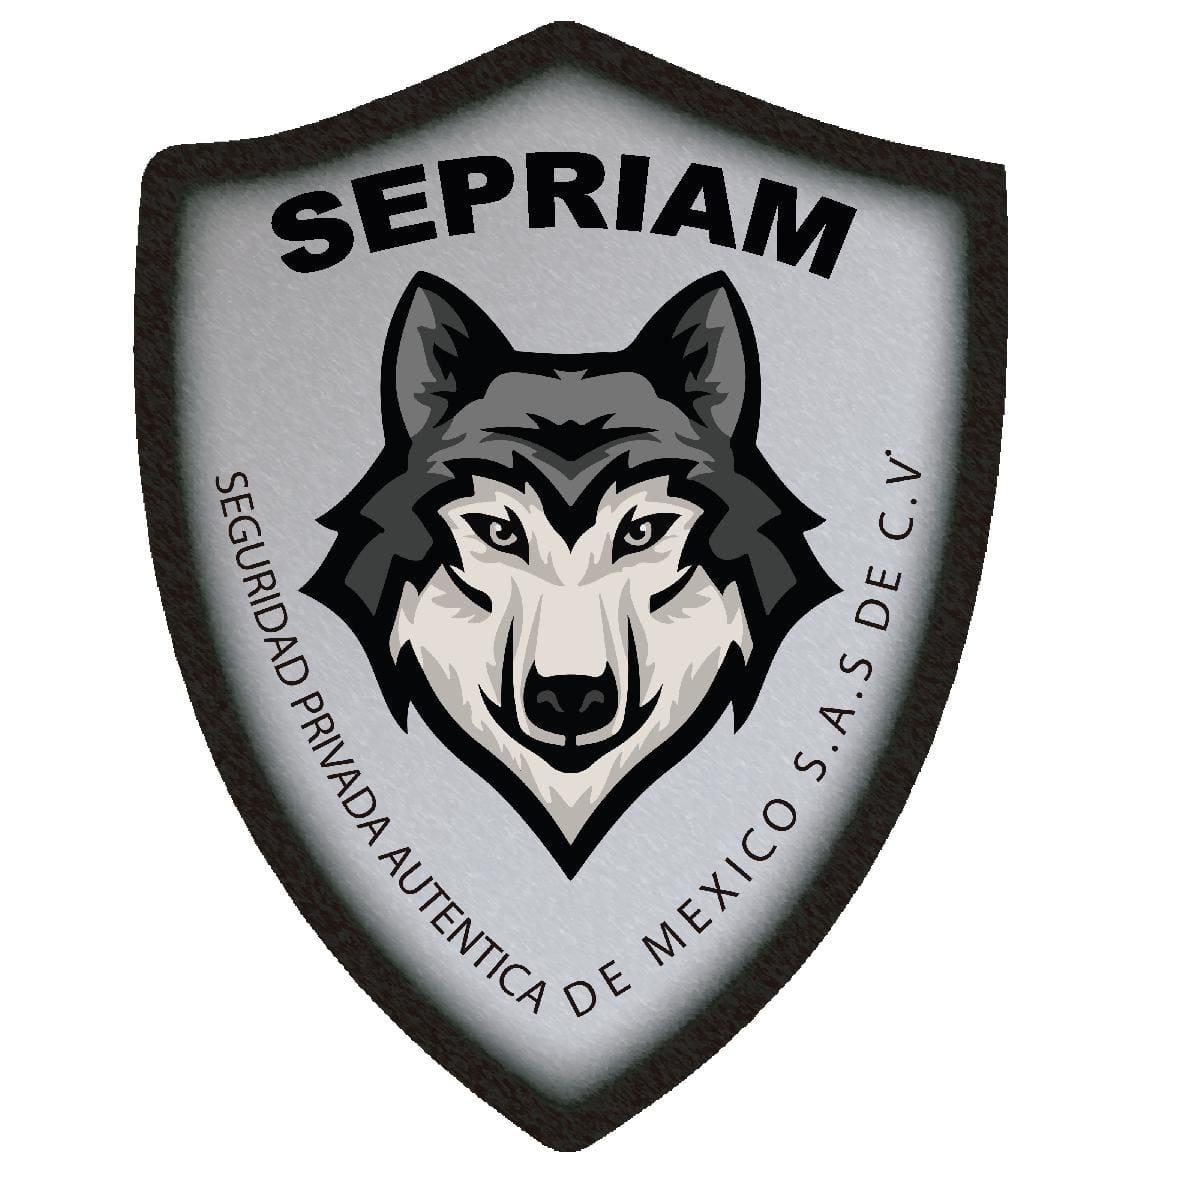 SEPRIAM Seguridad Privada Auténtica de México S.A.S de C.V.